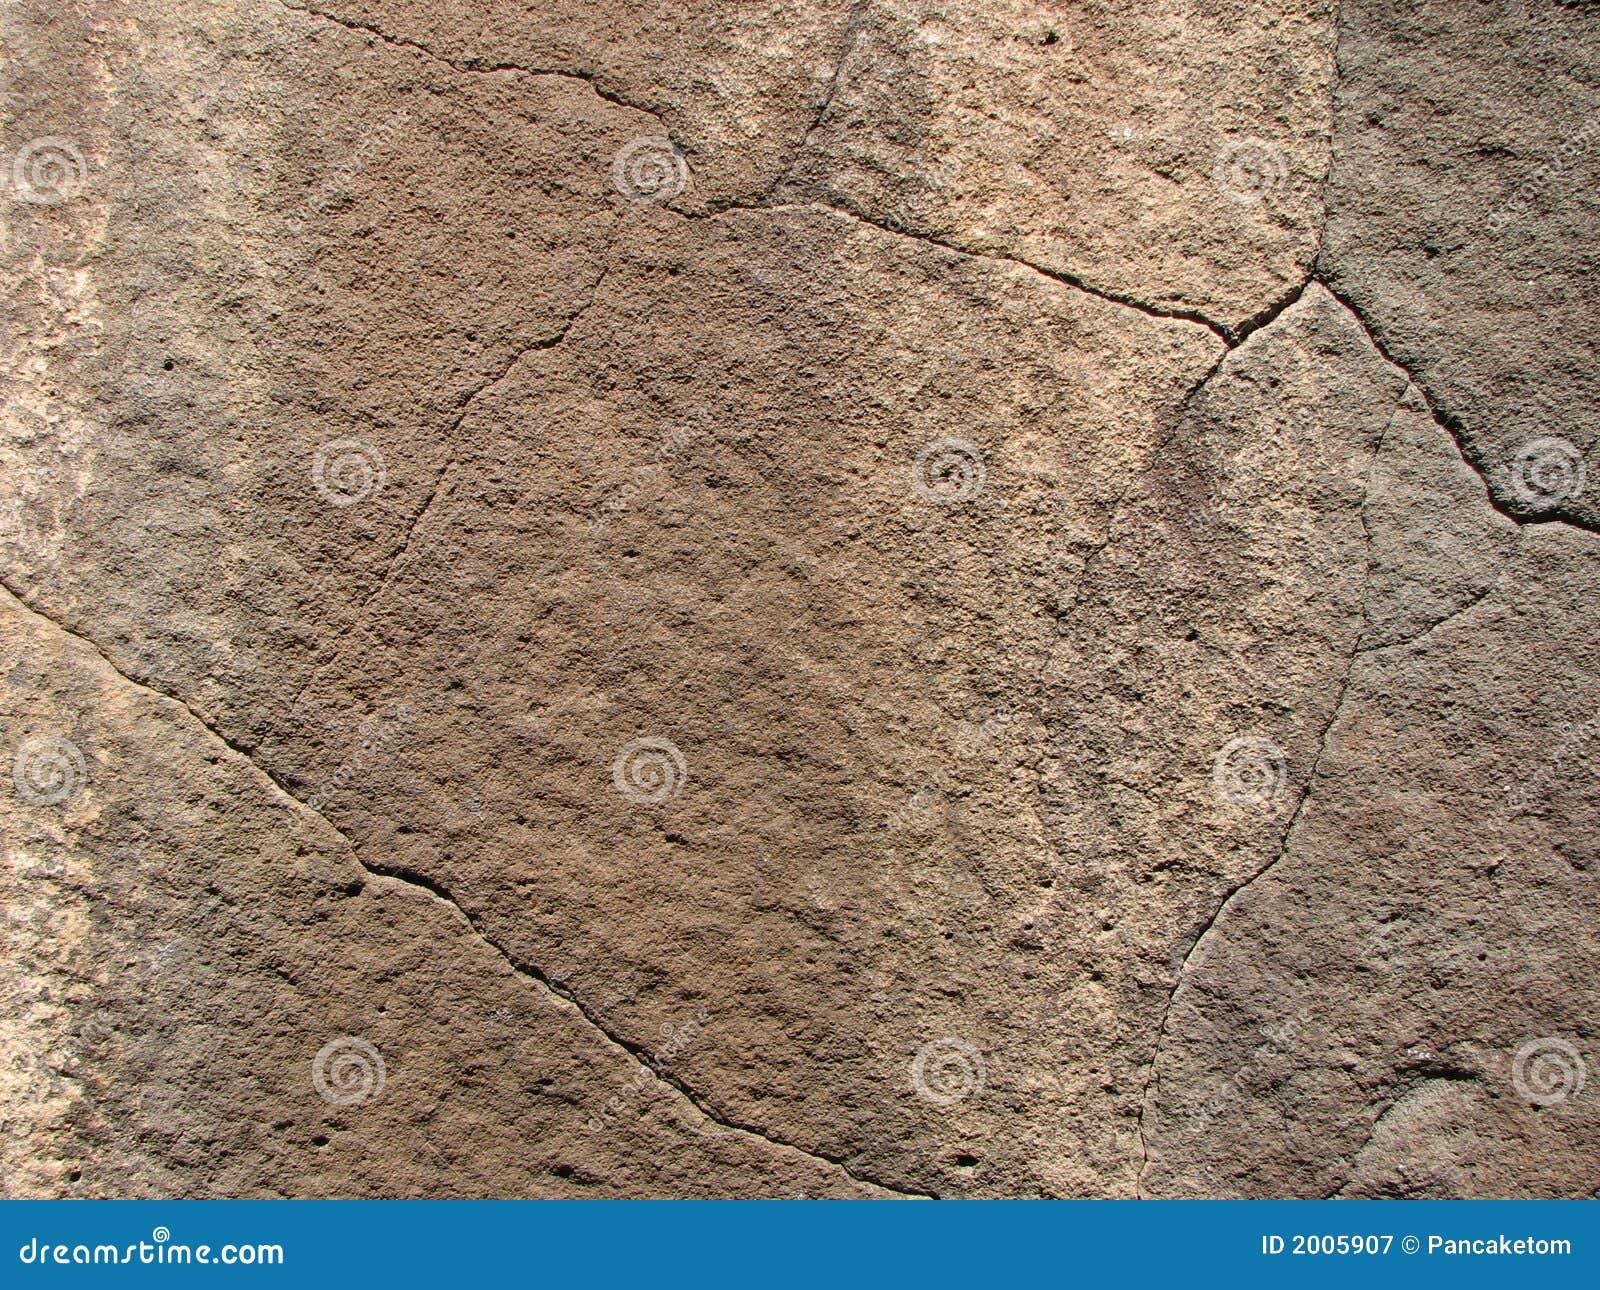 Cracked basalt face